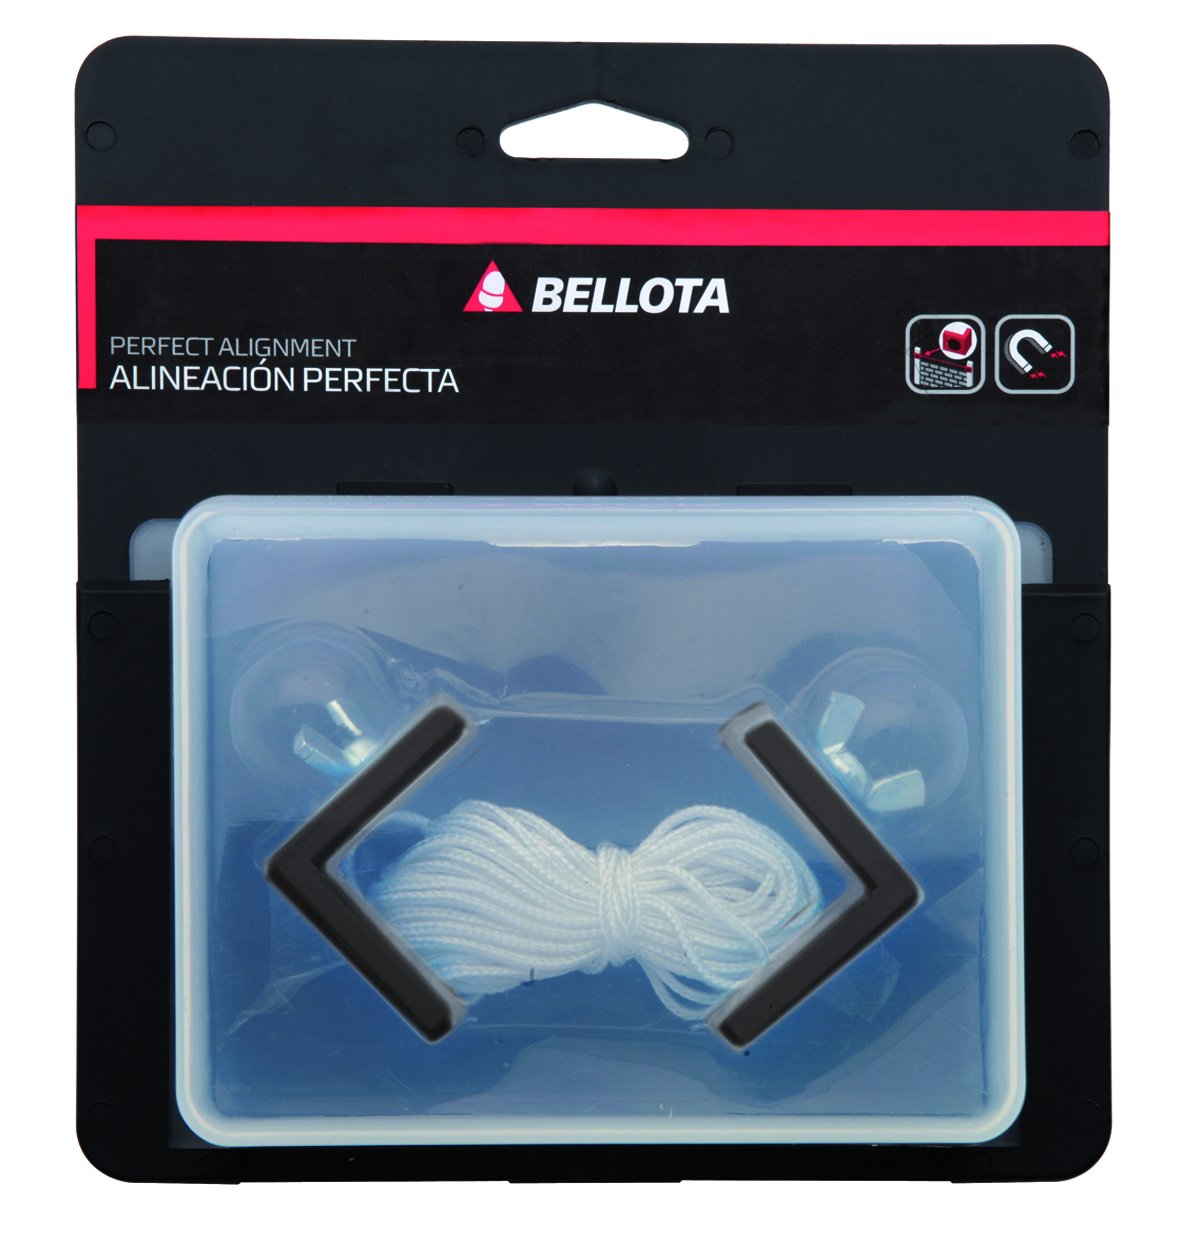 Bellota 50251 Winkel mit Magnet